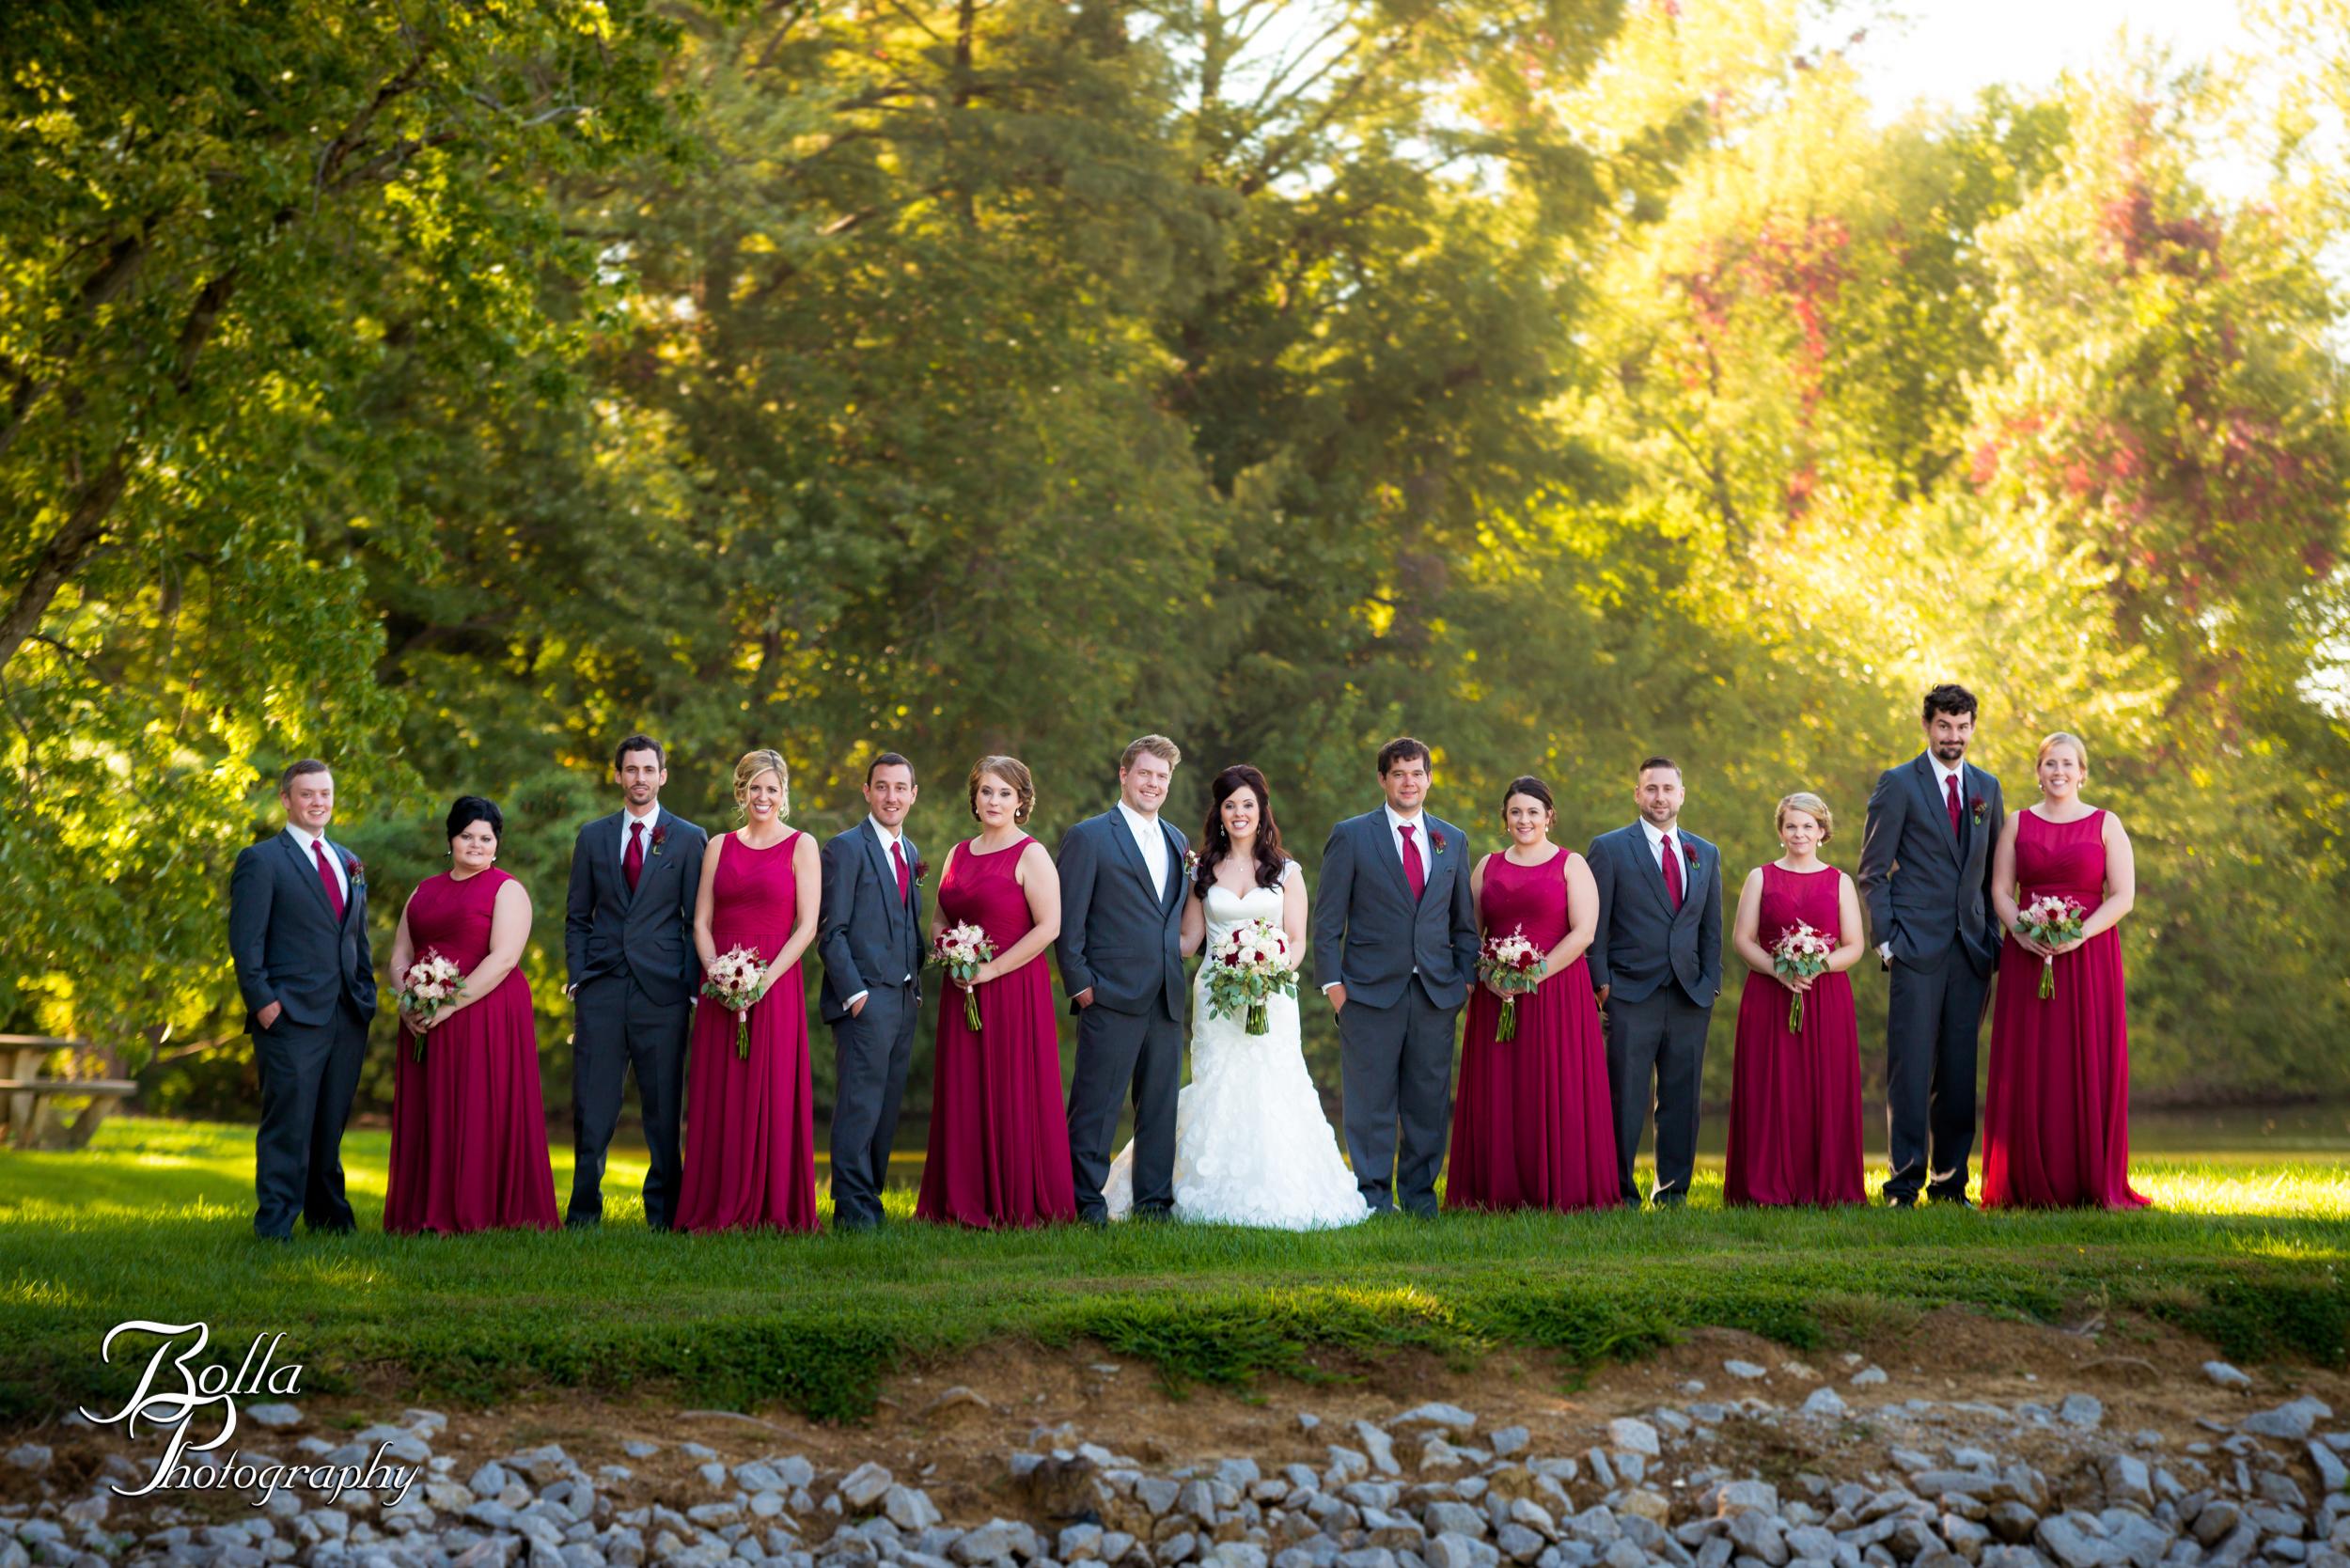 Bolla_photography_edwardsville_wedding_photographer_st_louis_weddings_Reilmann-0350.jpg